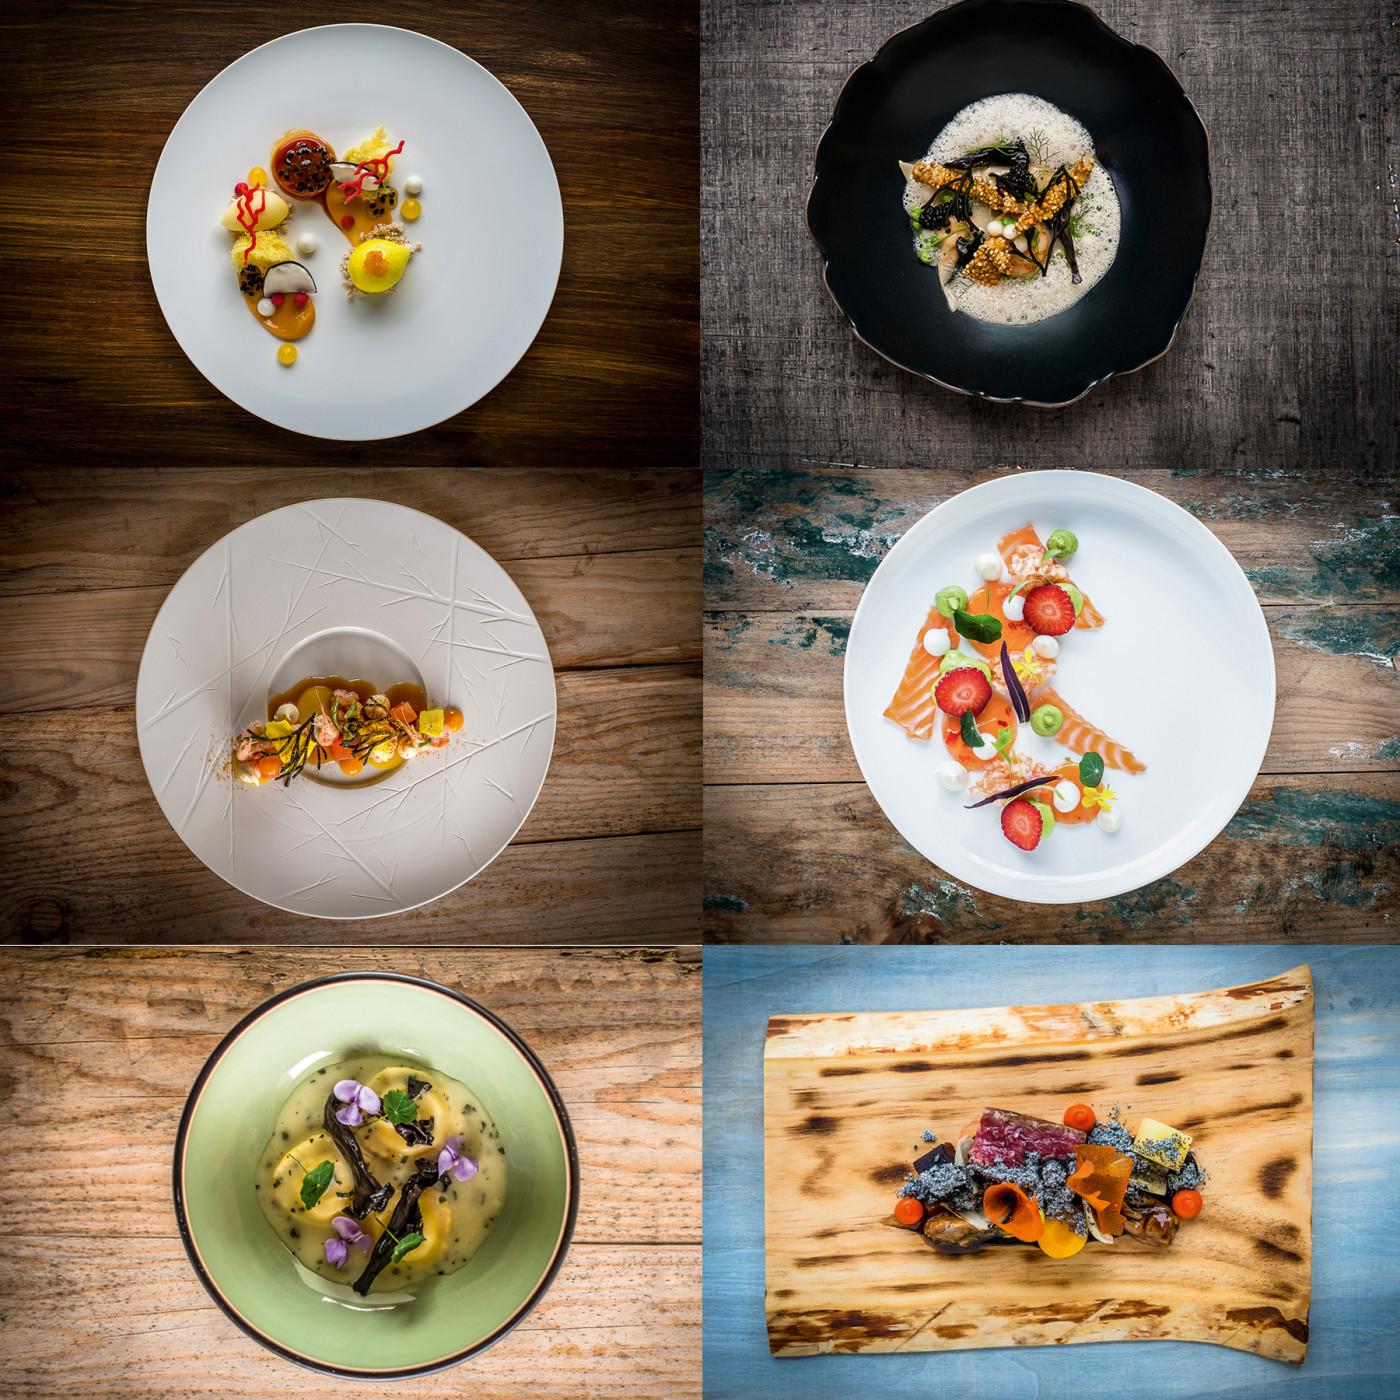 Portuguese Gastronomy: Best Luxury Restaurants in Portugal luxury restaurants Portuguese Gastronomy: Best Luxury Restaurants in Portugal VG 1421 2 1485948004